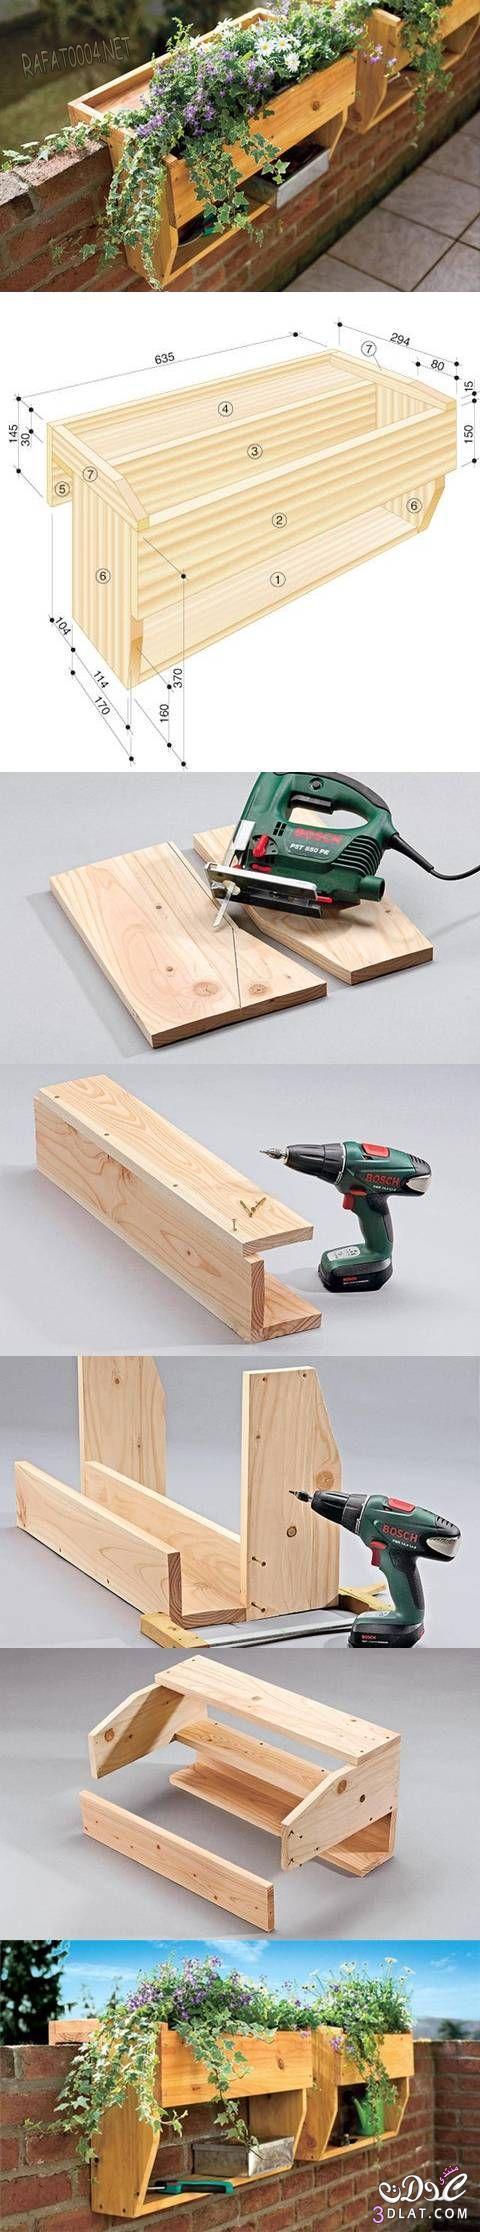 طريقة عمل رفوف اواني النباتات Railings Shelves Pots 13893696661.jpg